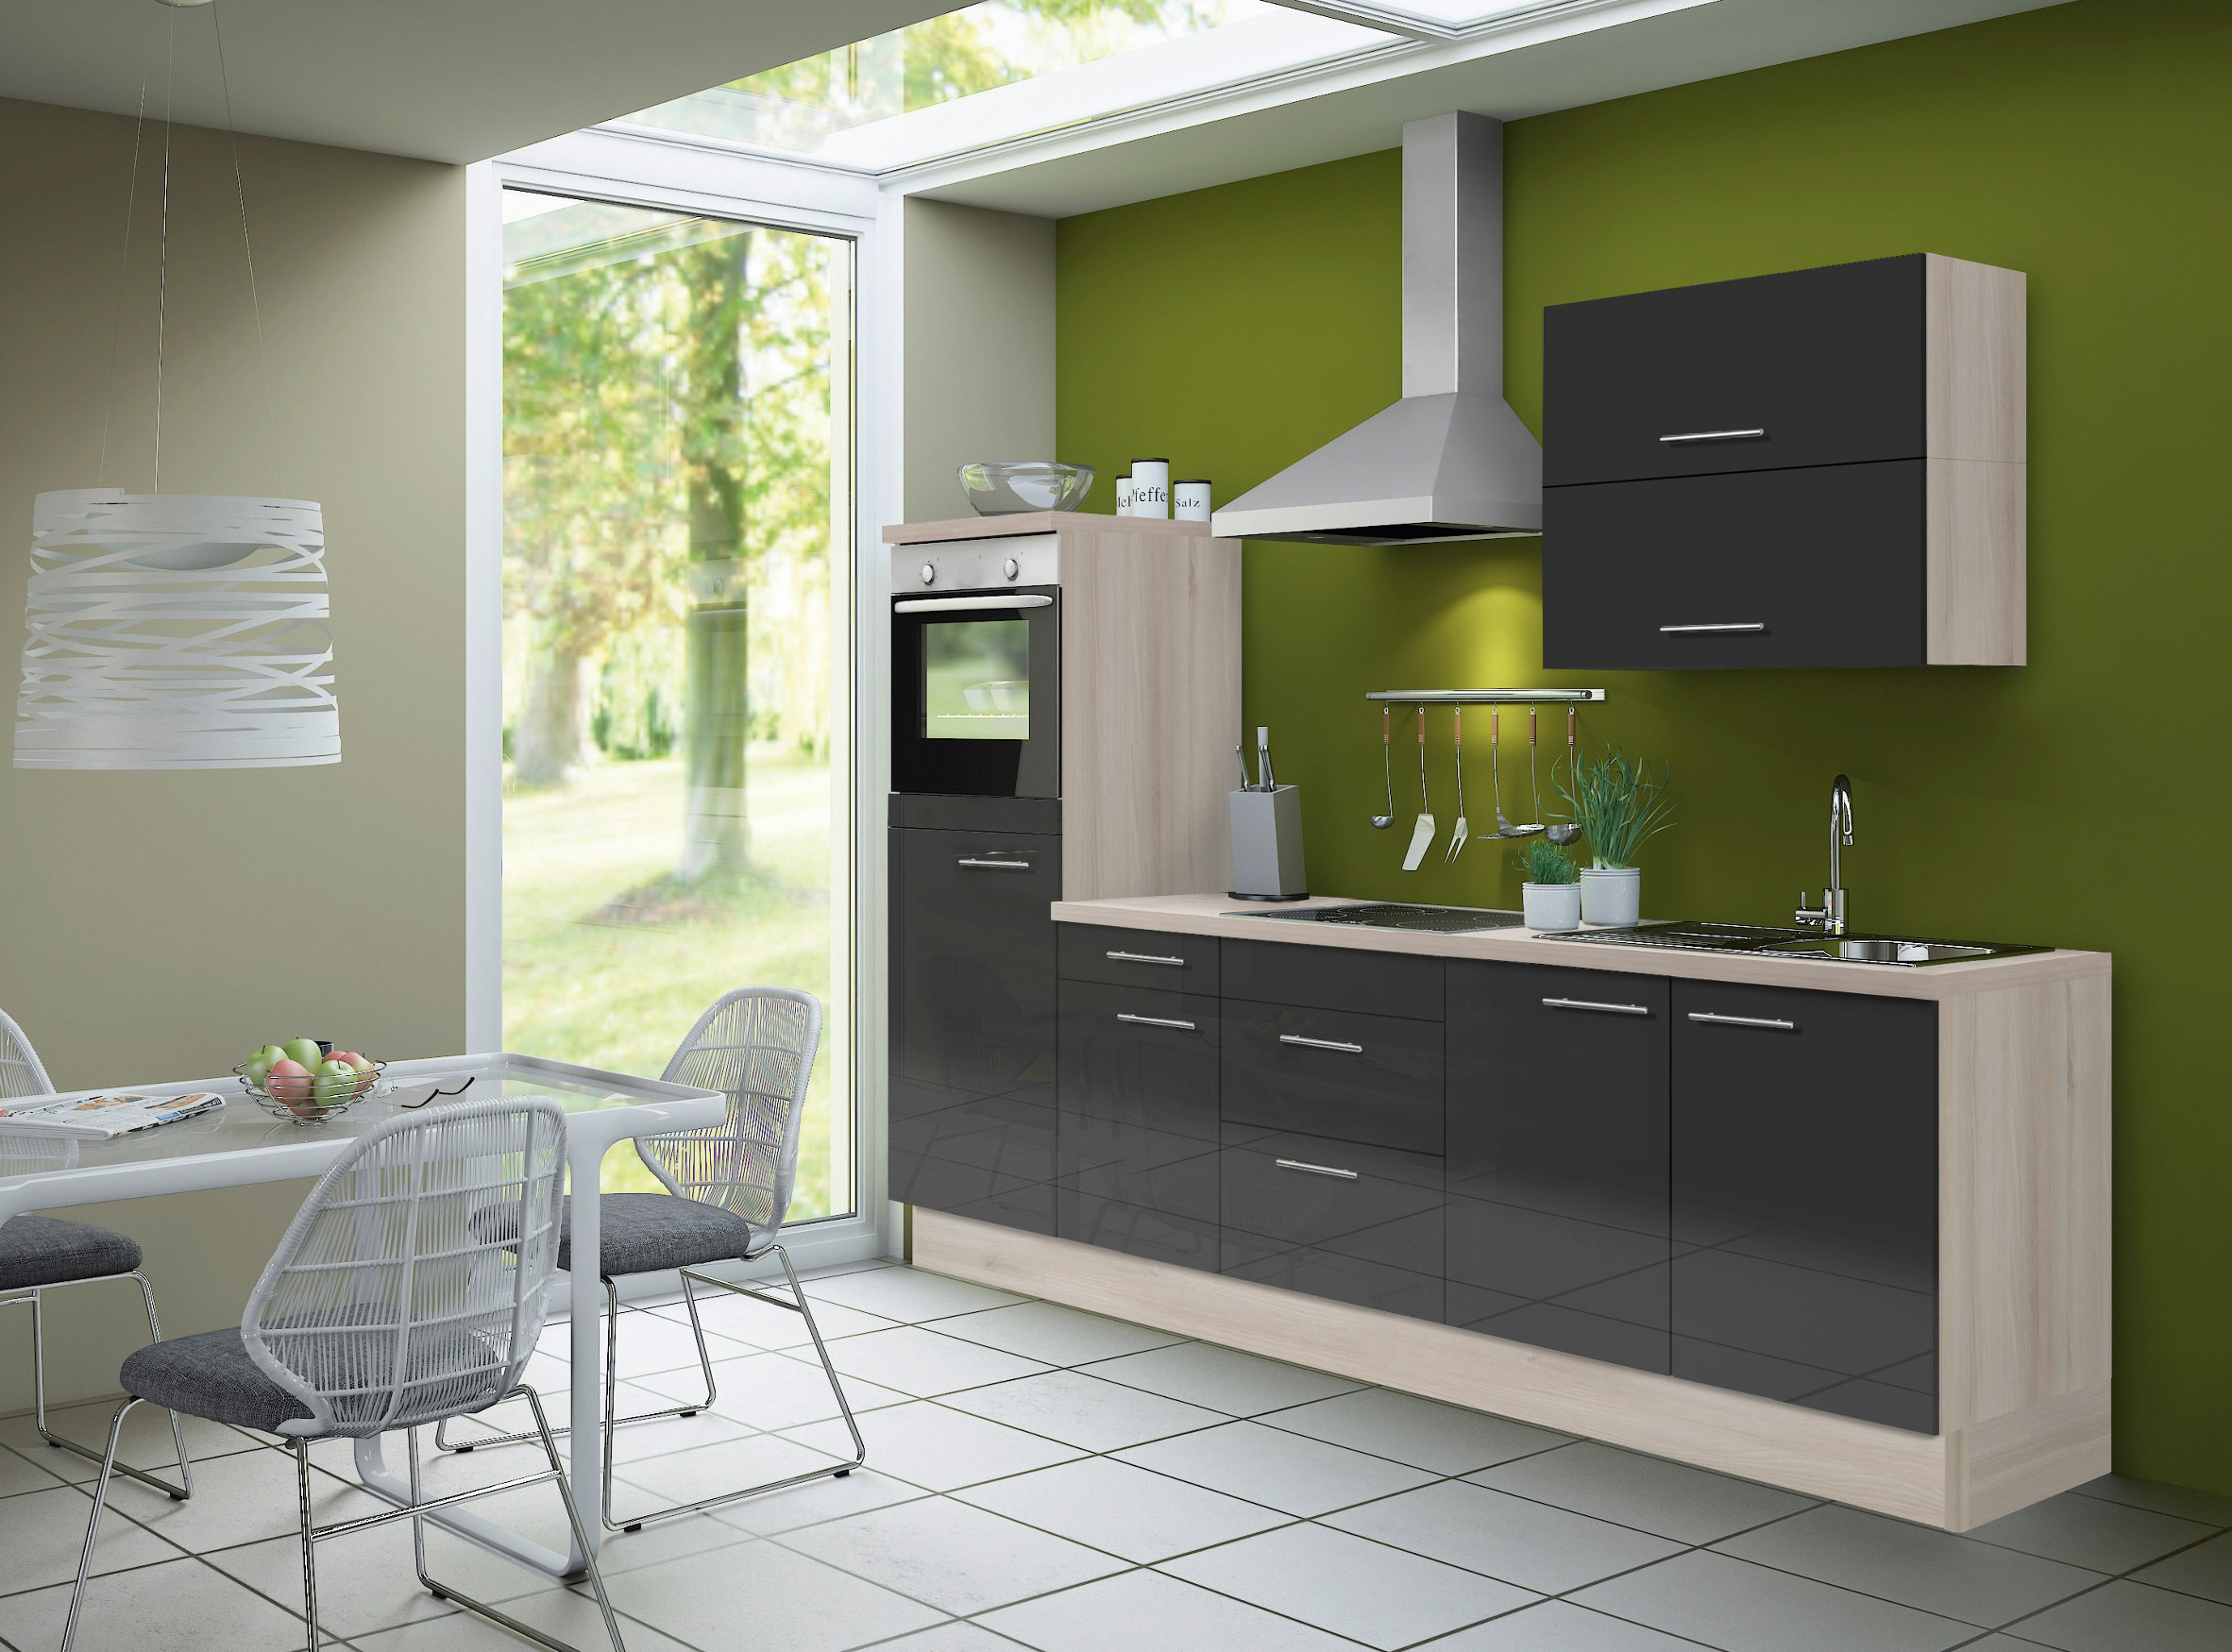 k chenzeile leon vario 7 k che mit e ger ten breite. Black Bedroom Furniture Sets. Home Design Ideas